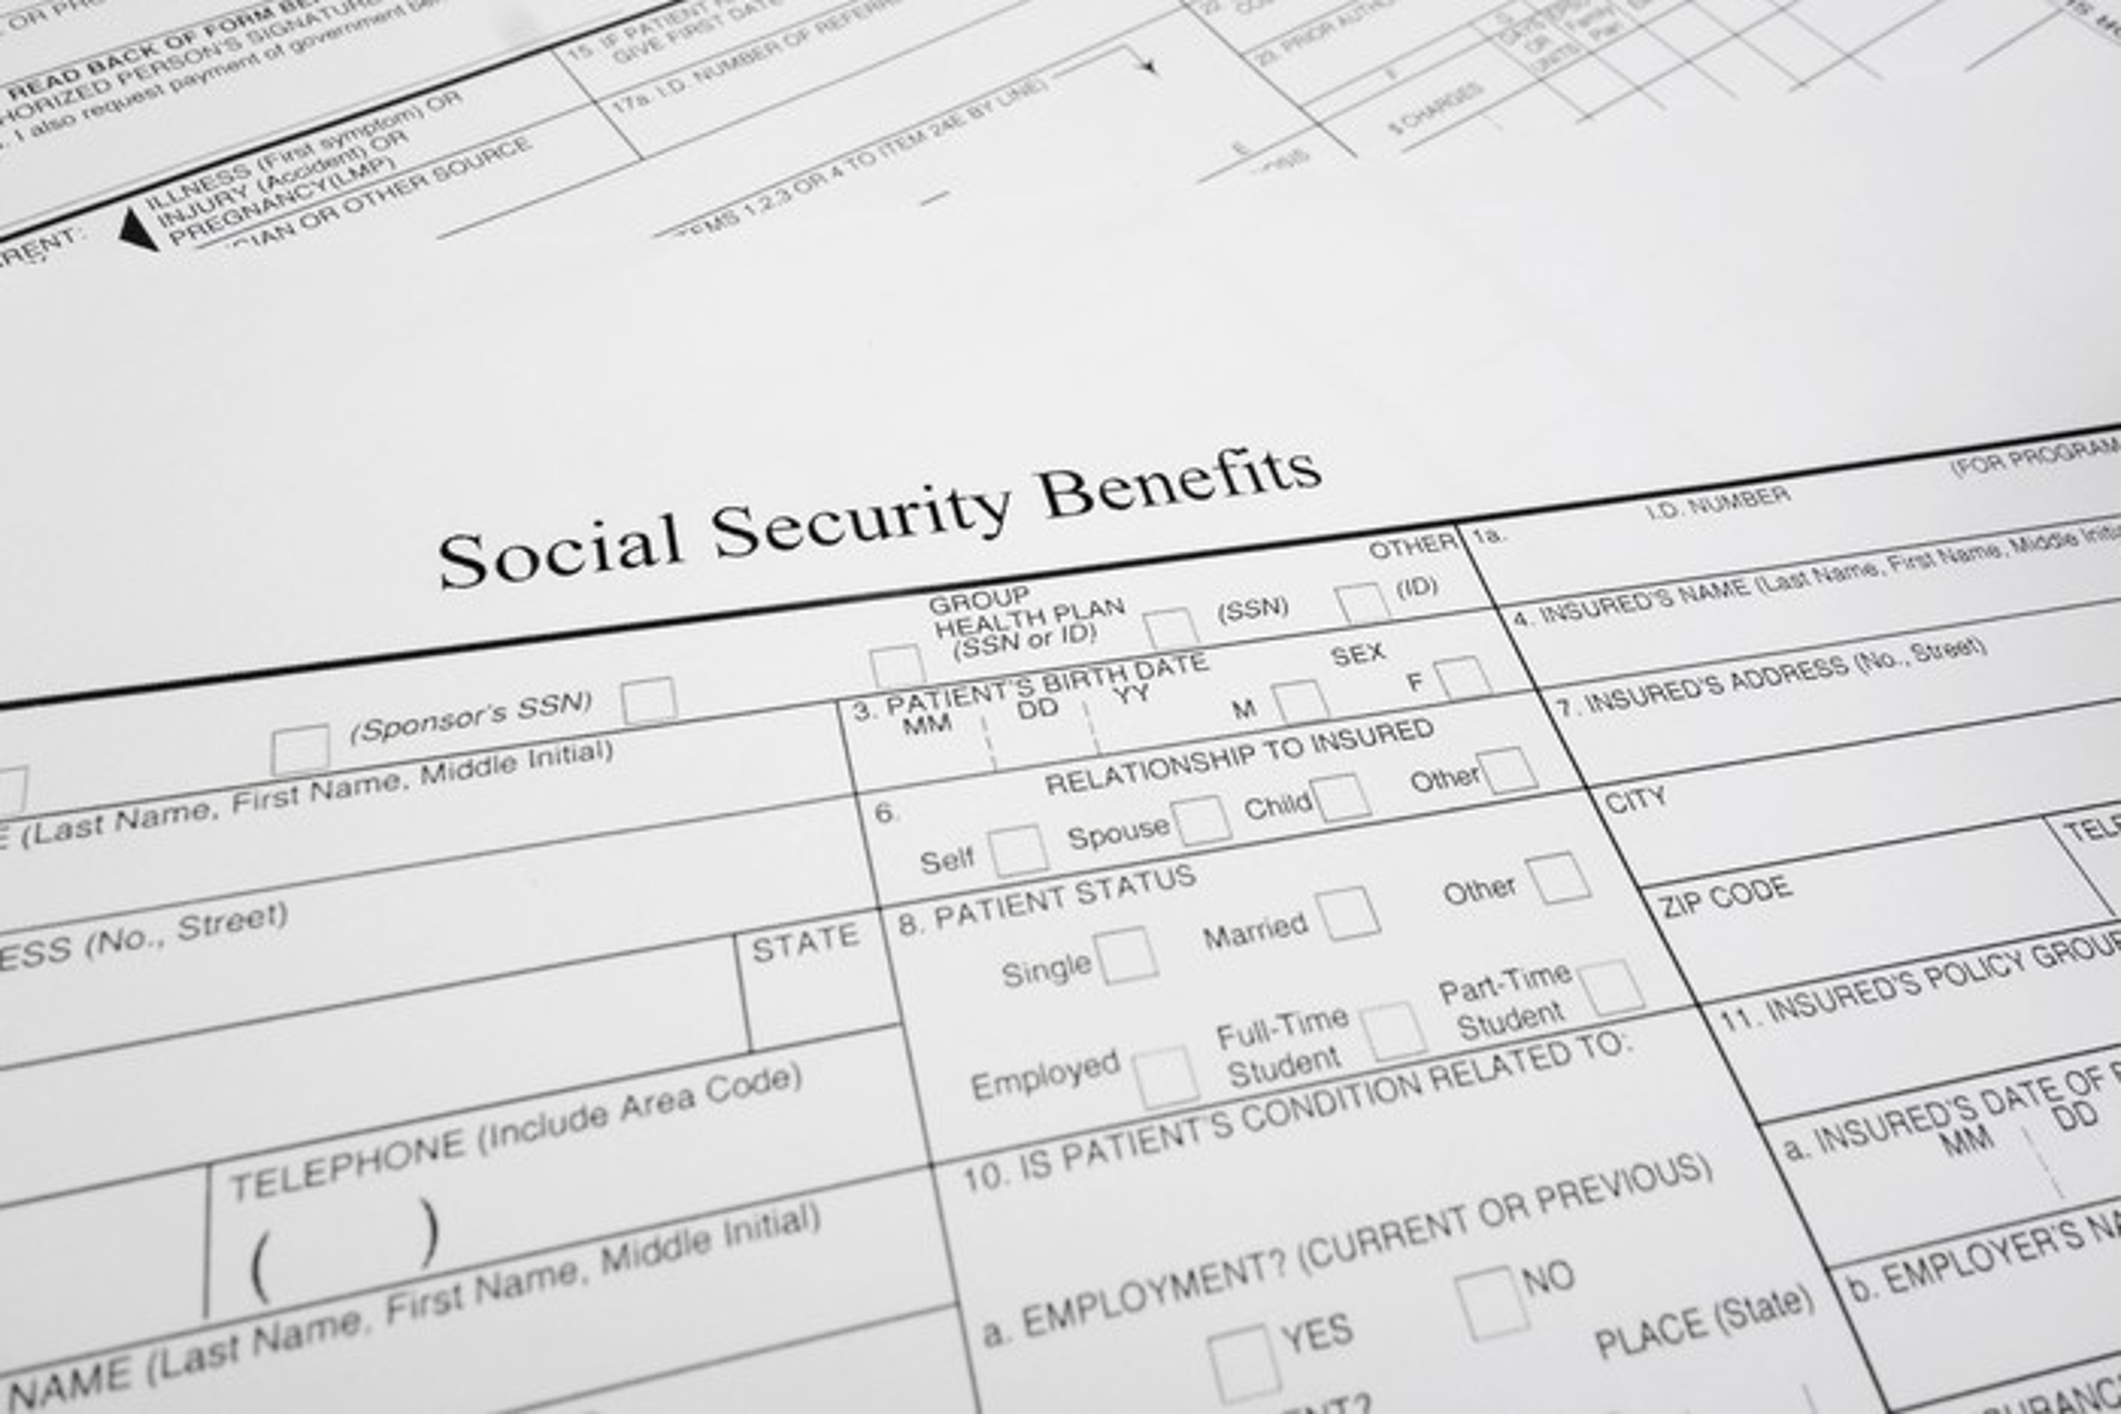 Social Security benefits form